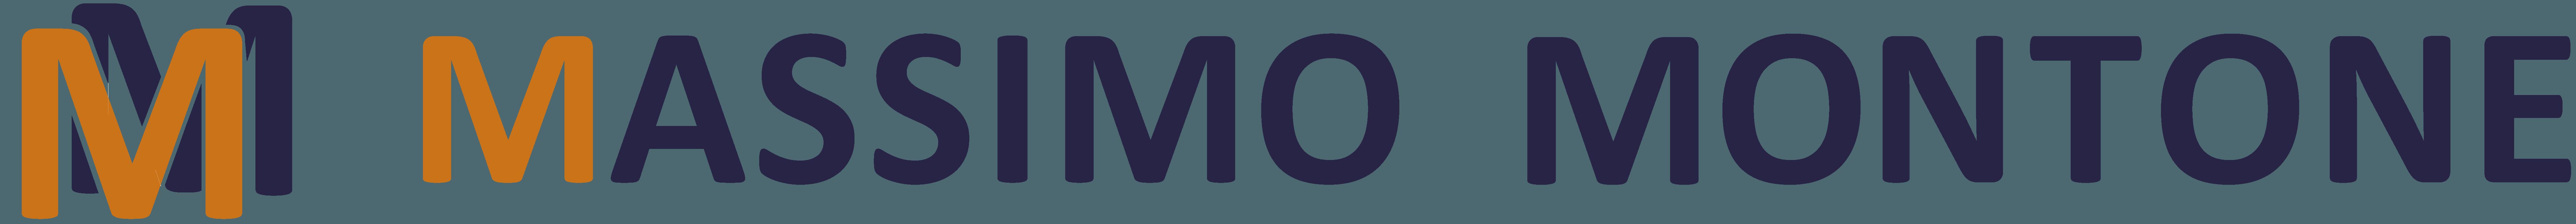 Massimo Montone | Consultant | Coach | Advisor